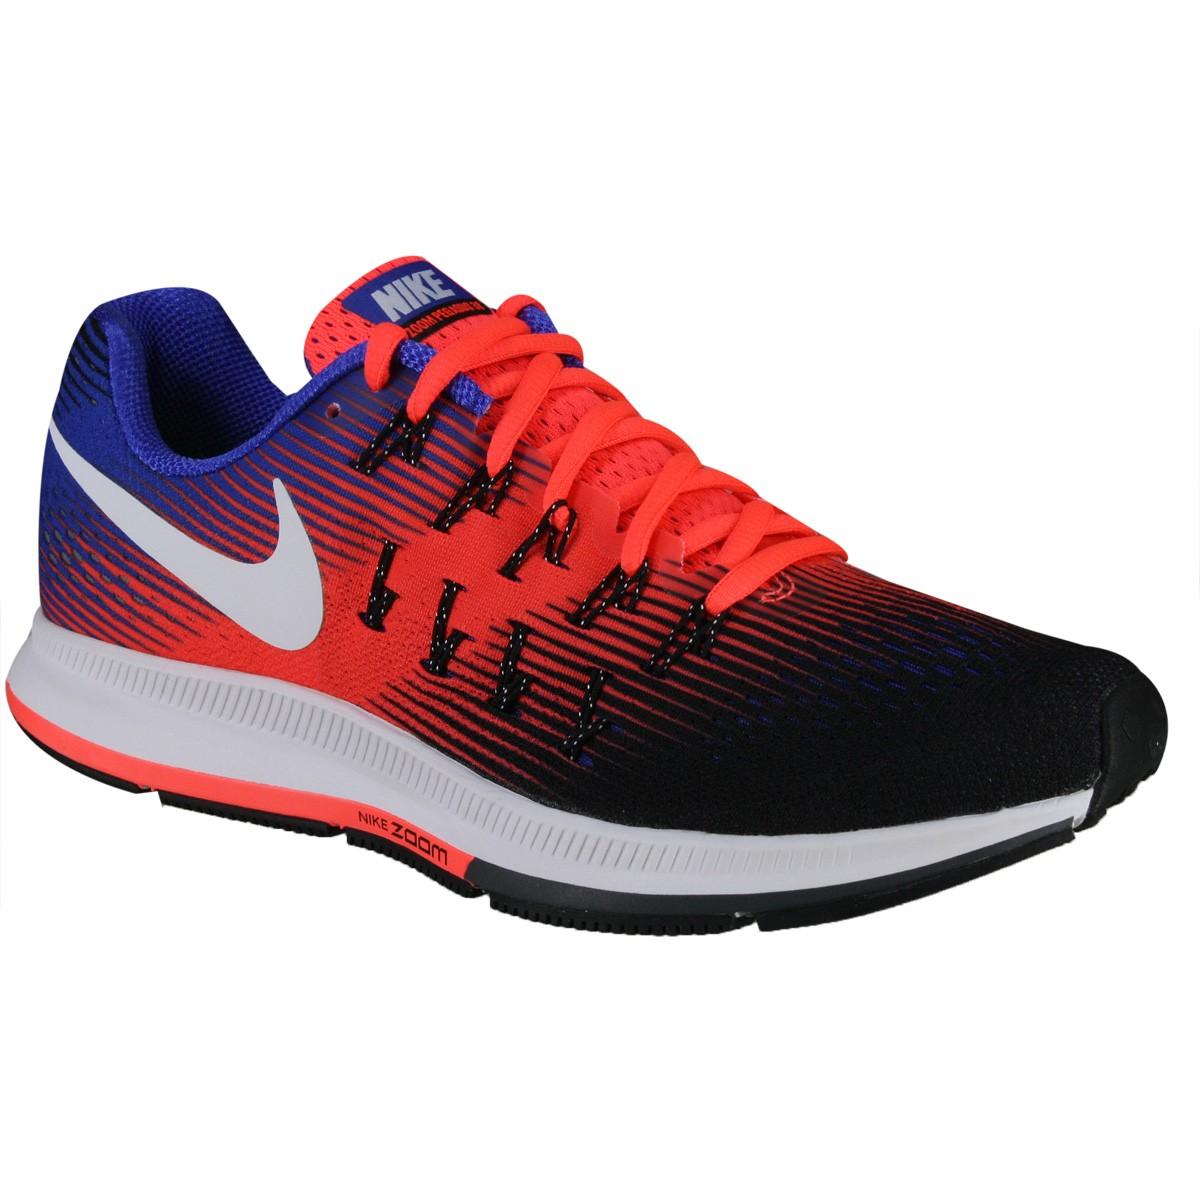 ebcd3970617 Tênis Nike Masculino Air Zoom Pegasus 33 831352-010 - Preto Azul ...